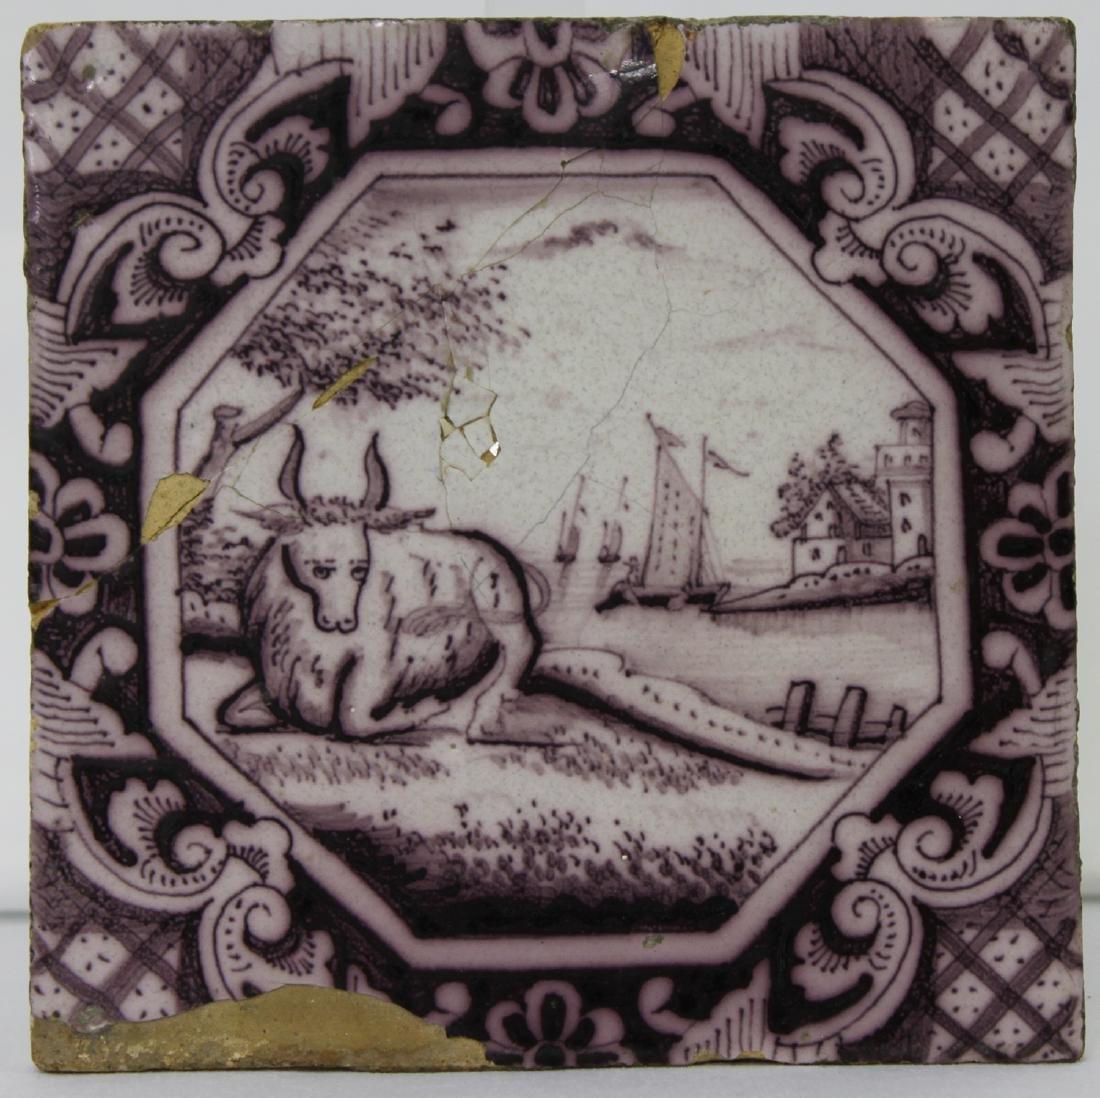 Late 17 / Early 18 Century Dutch Delft Purple Tile - 3